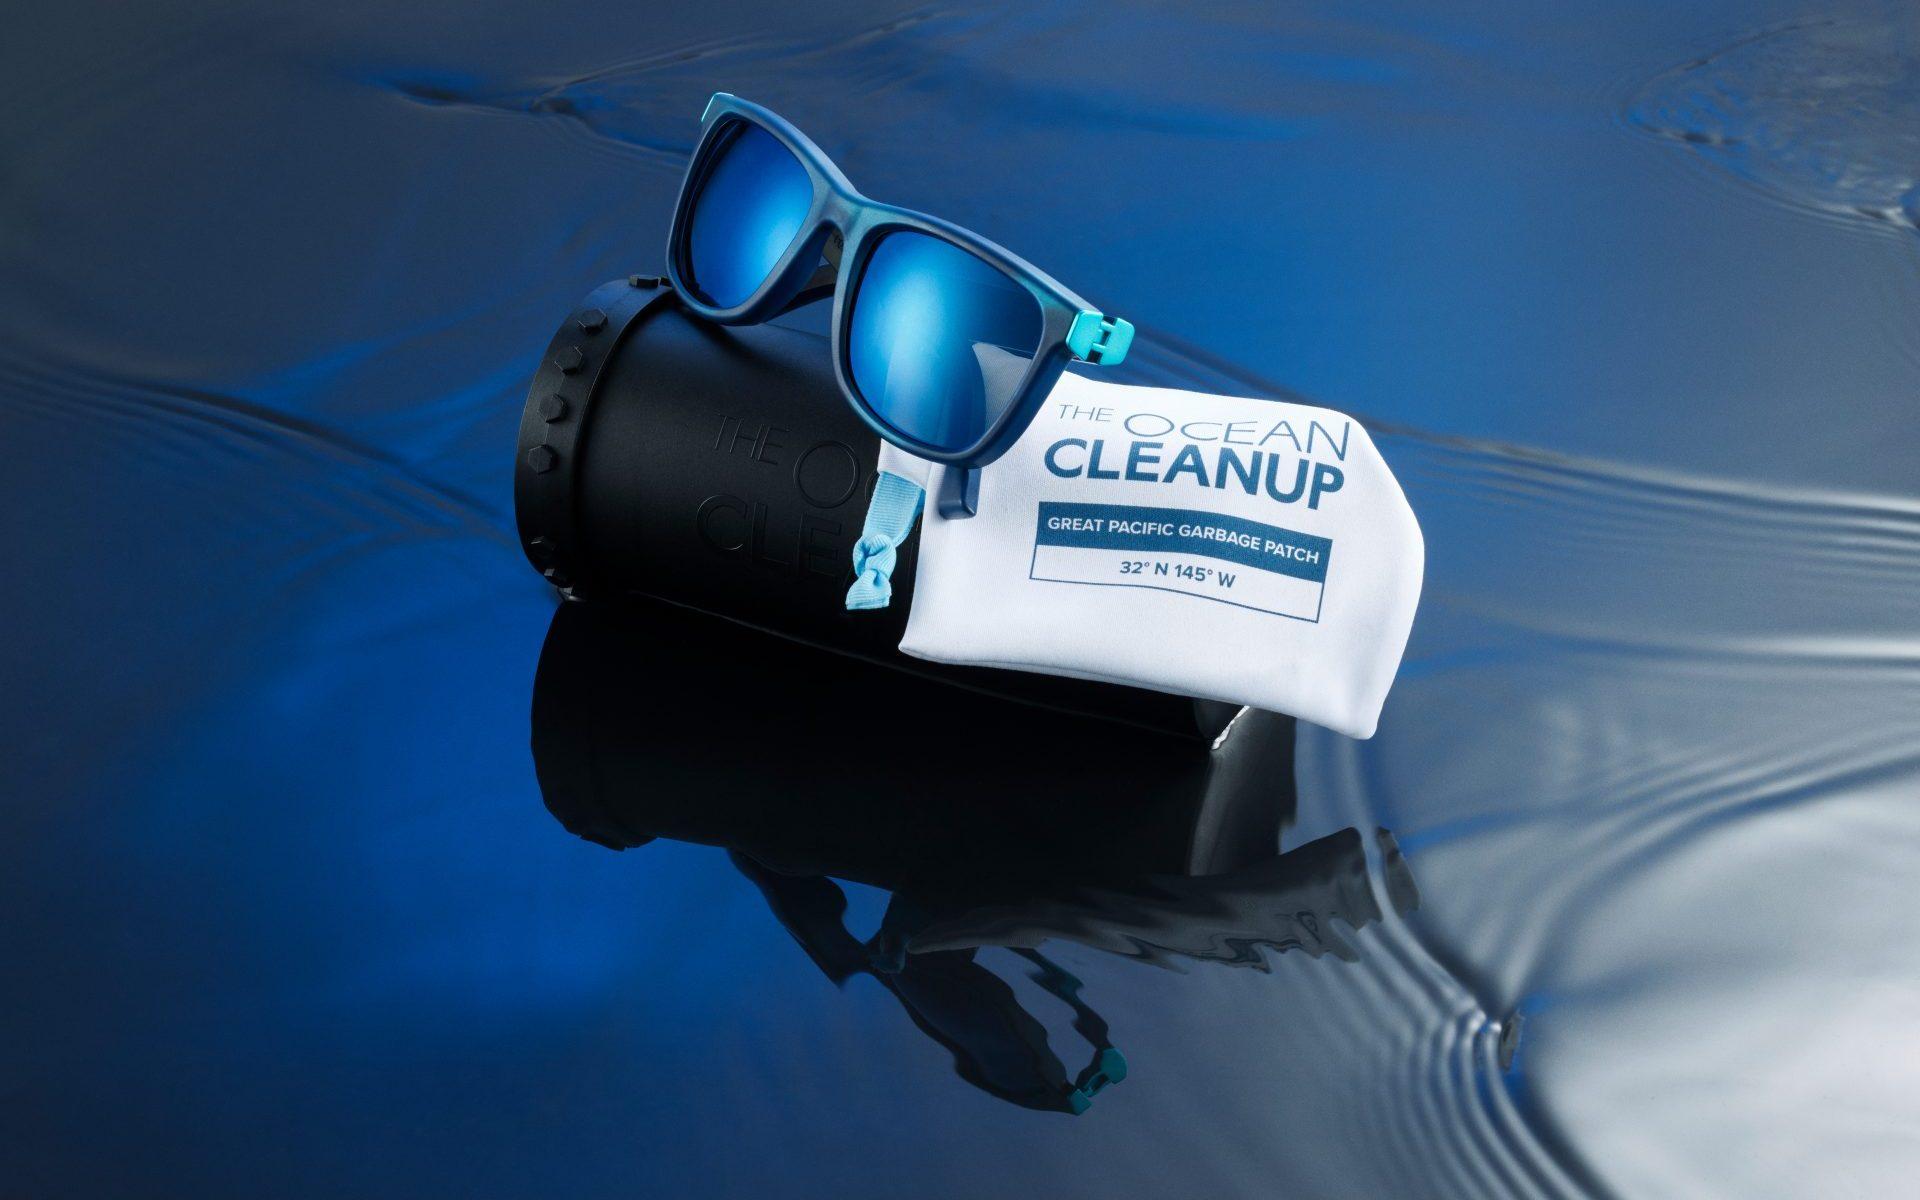 Ocean Cleanup Sunglasses